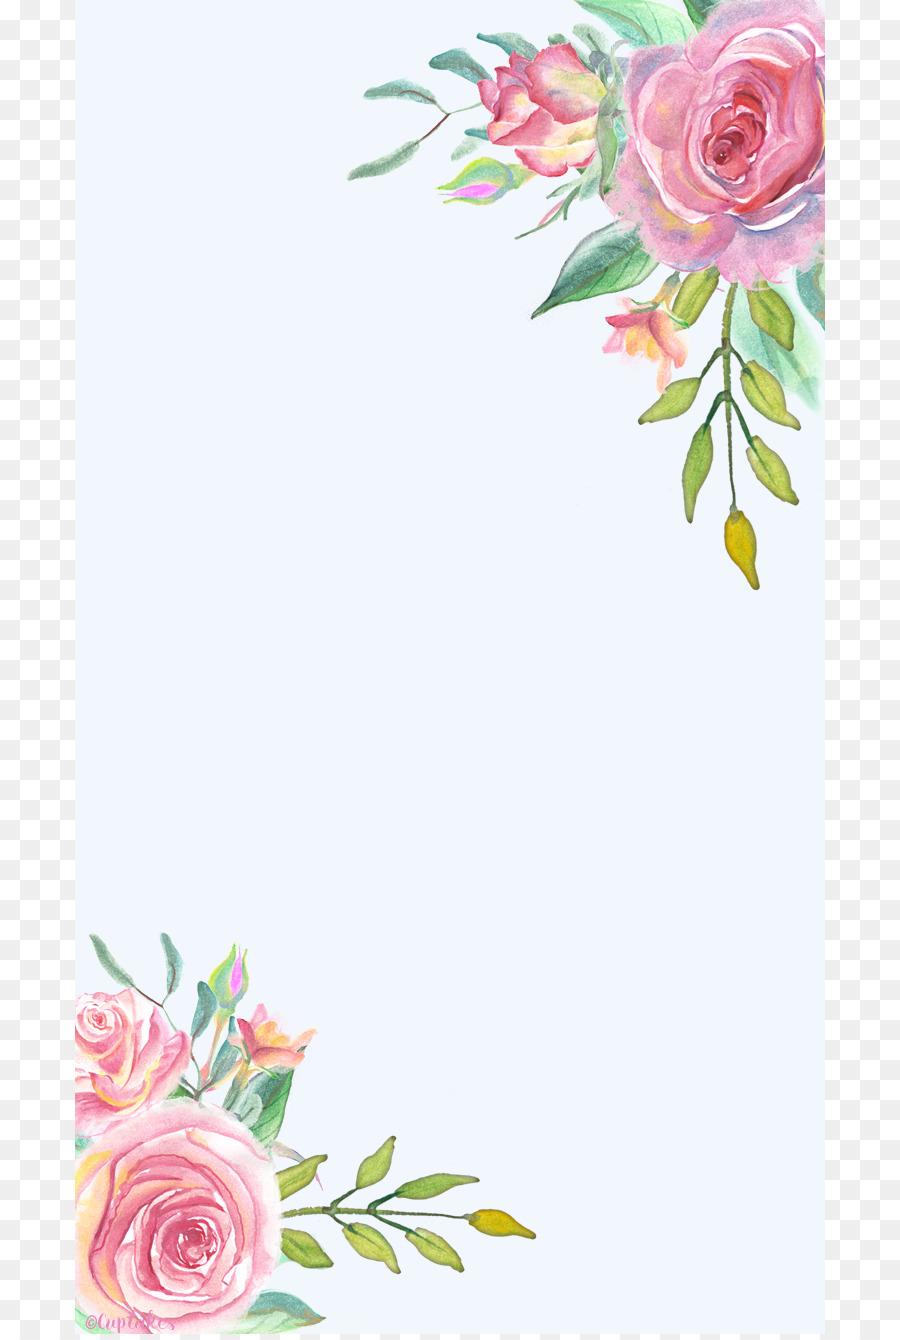 Watercolor Screensaver At Getdrawings Com Free For Personal Use